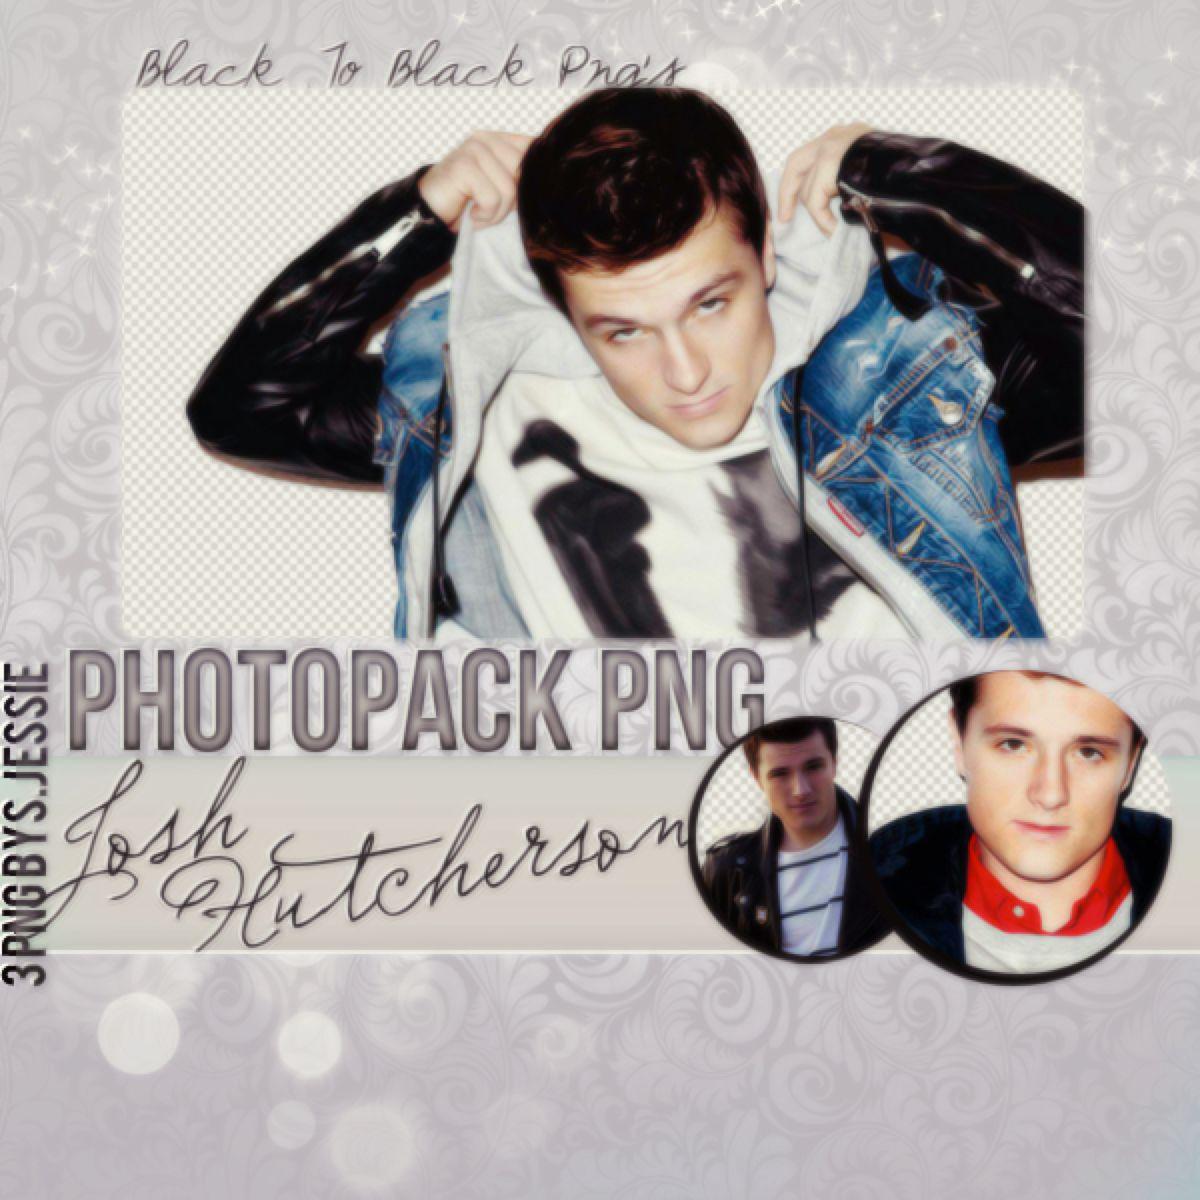 Josh Hutcherson Png Pack by S-JessiePNG on @DeviantArt